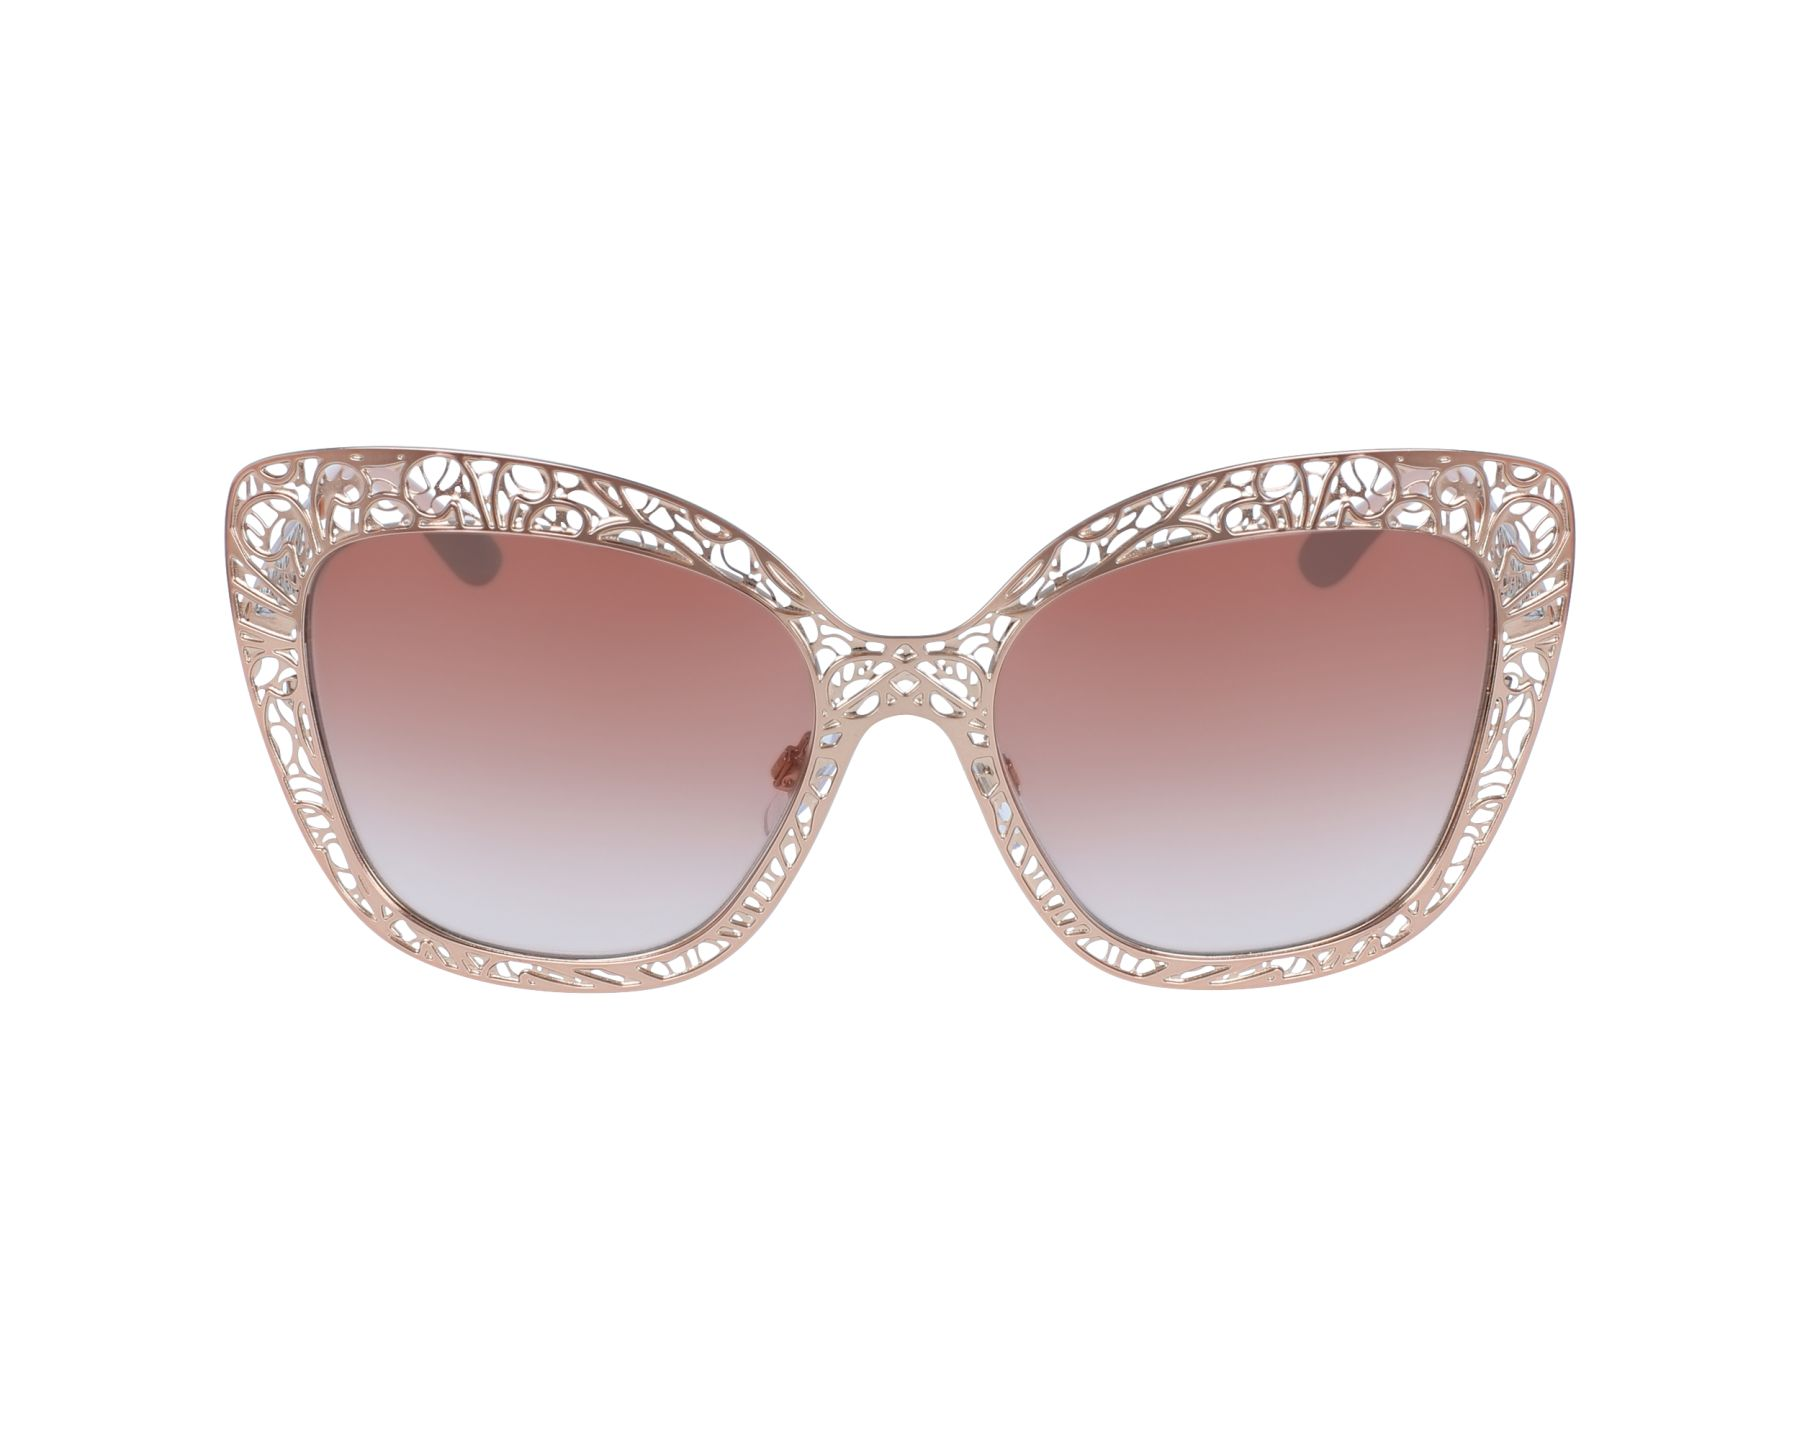 Dolce & Gabbana DG2164 02/13 56-18 6tjfMuc